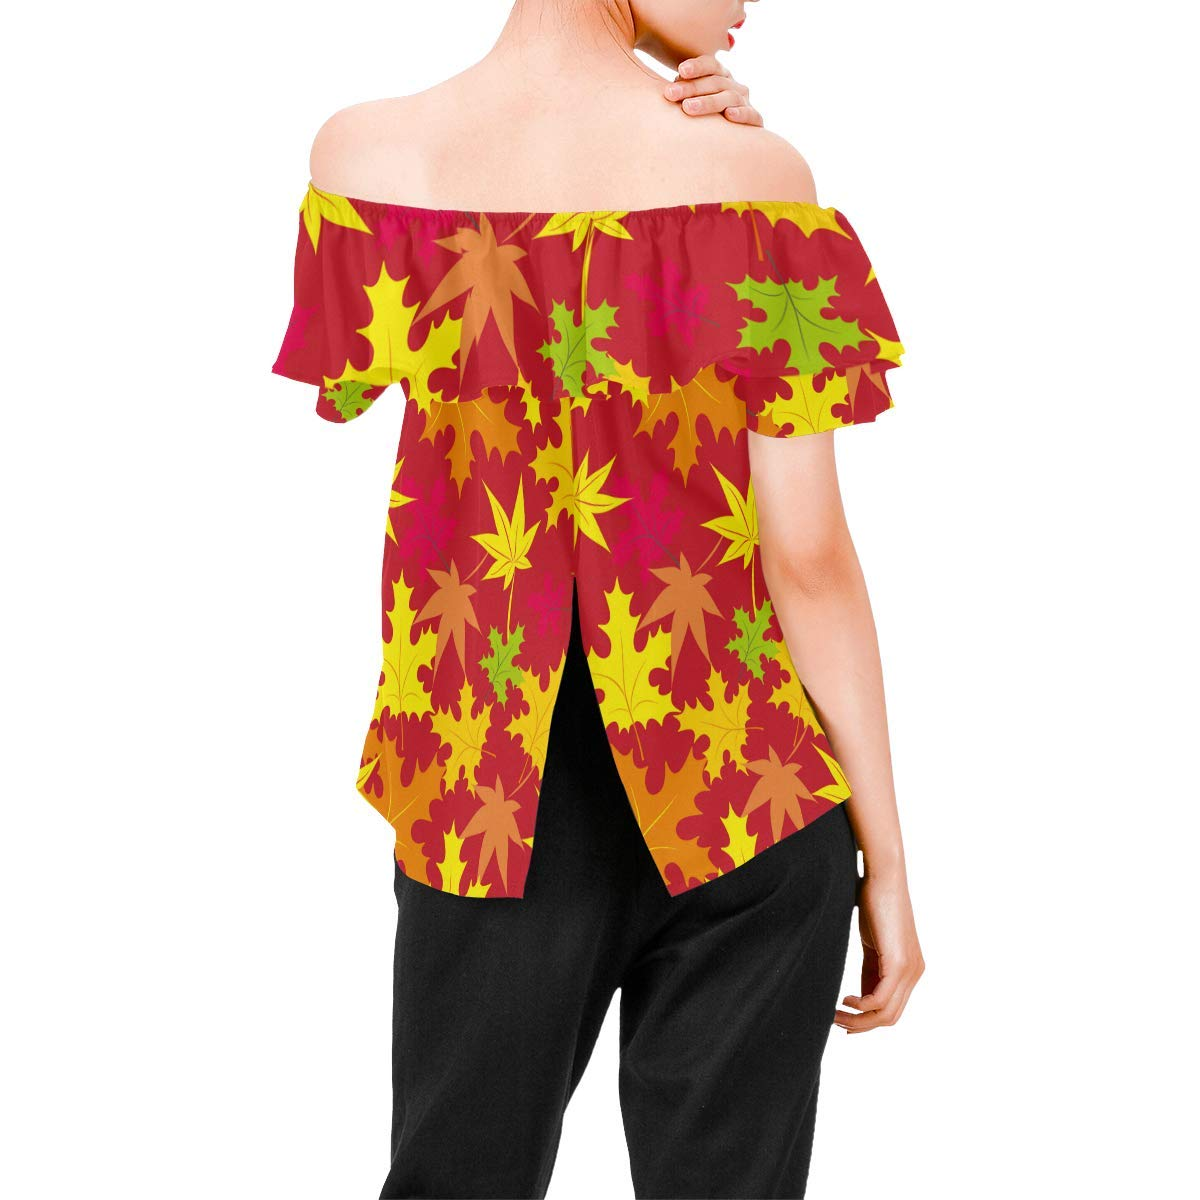 Vintage Floral Womens A-Line Chiffon Blouse Shirt Tops